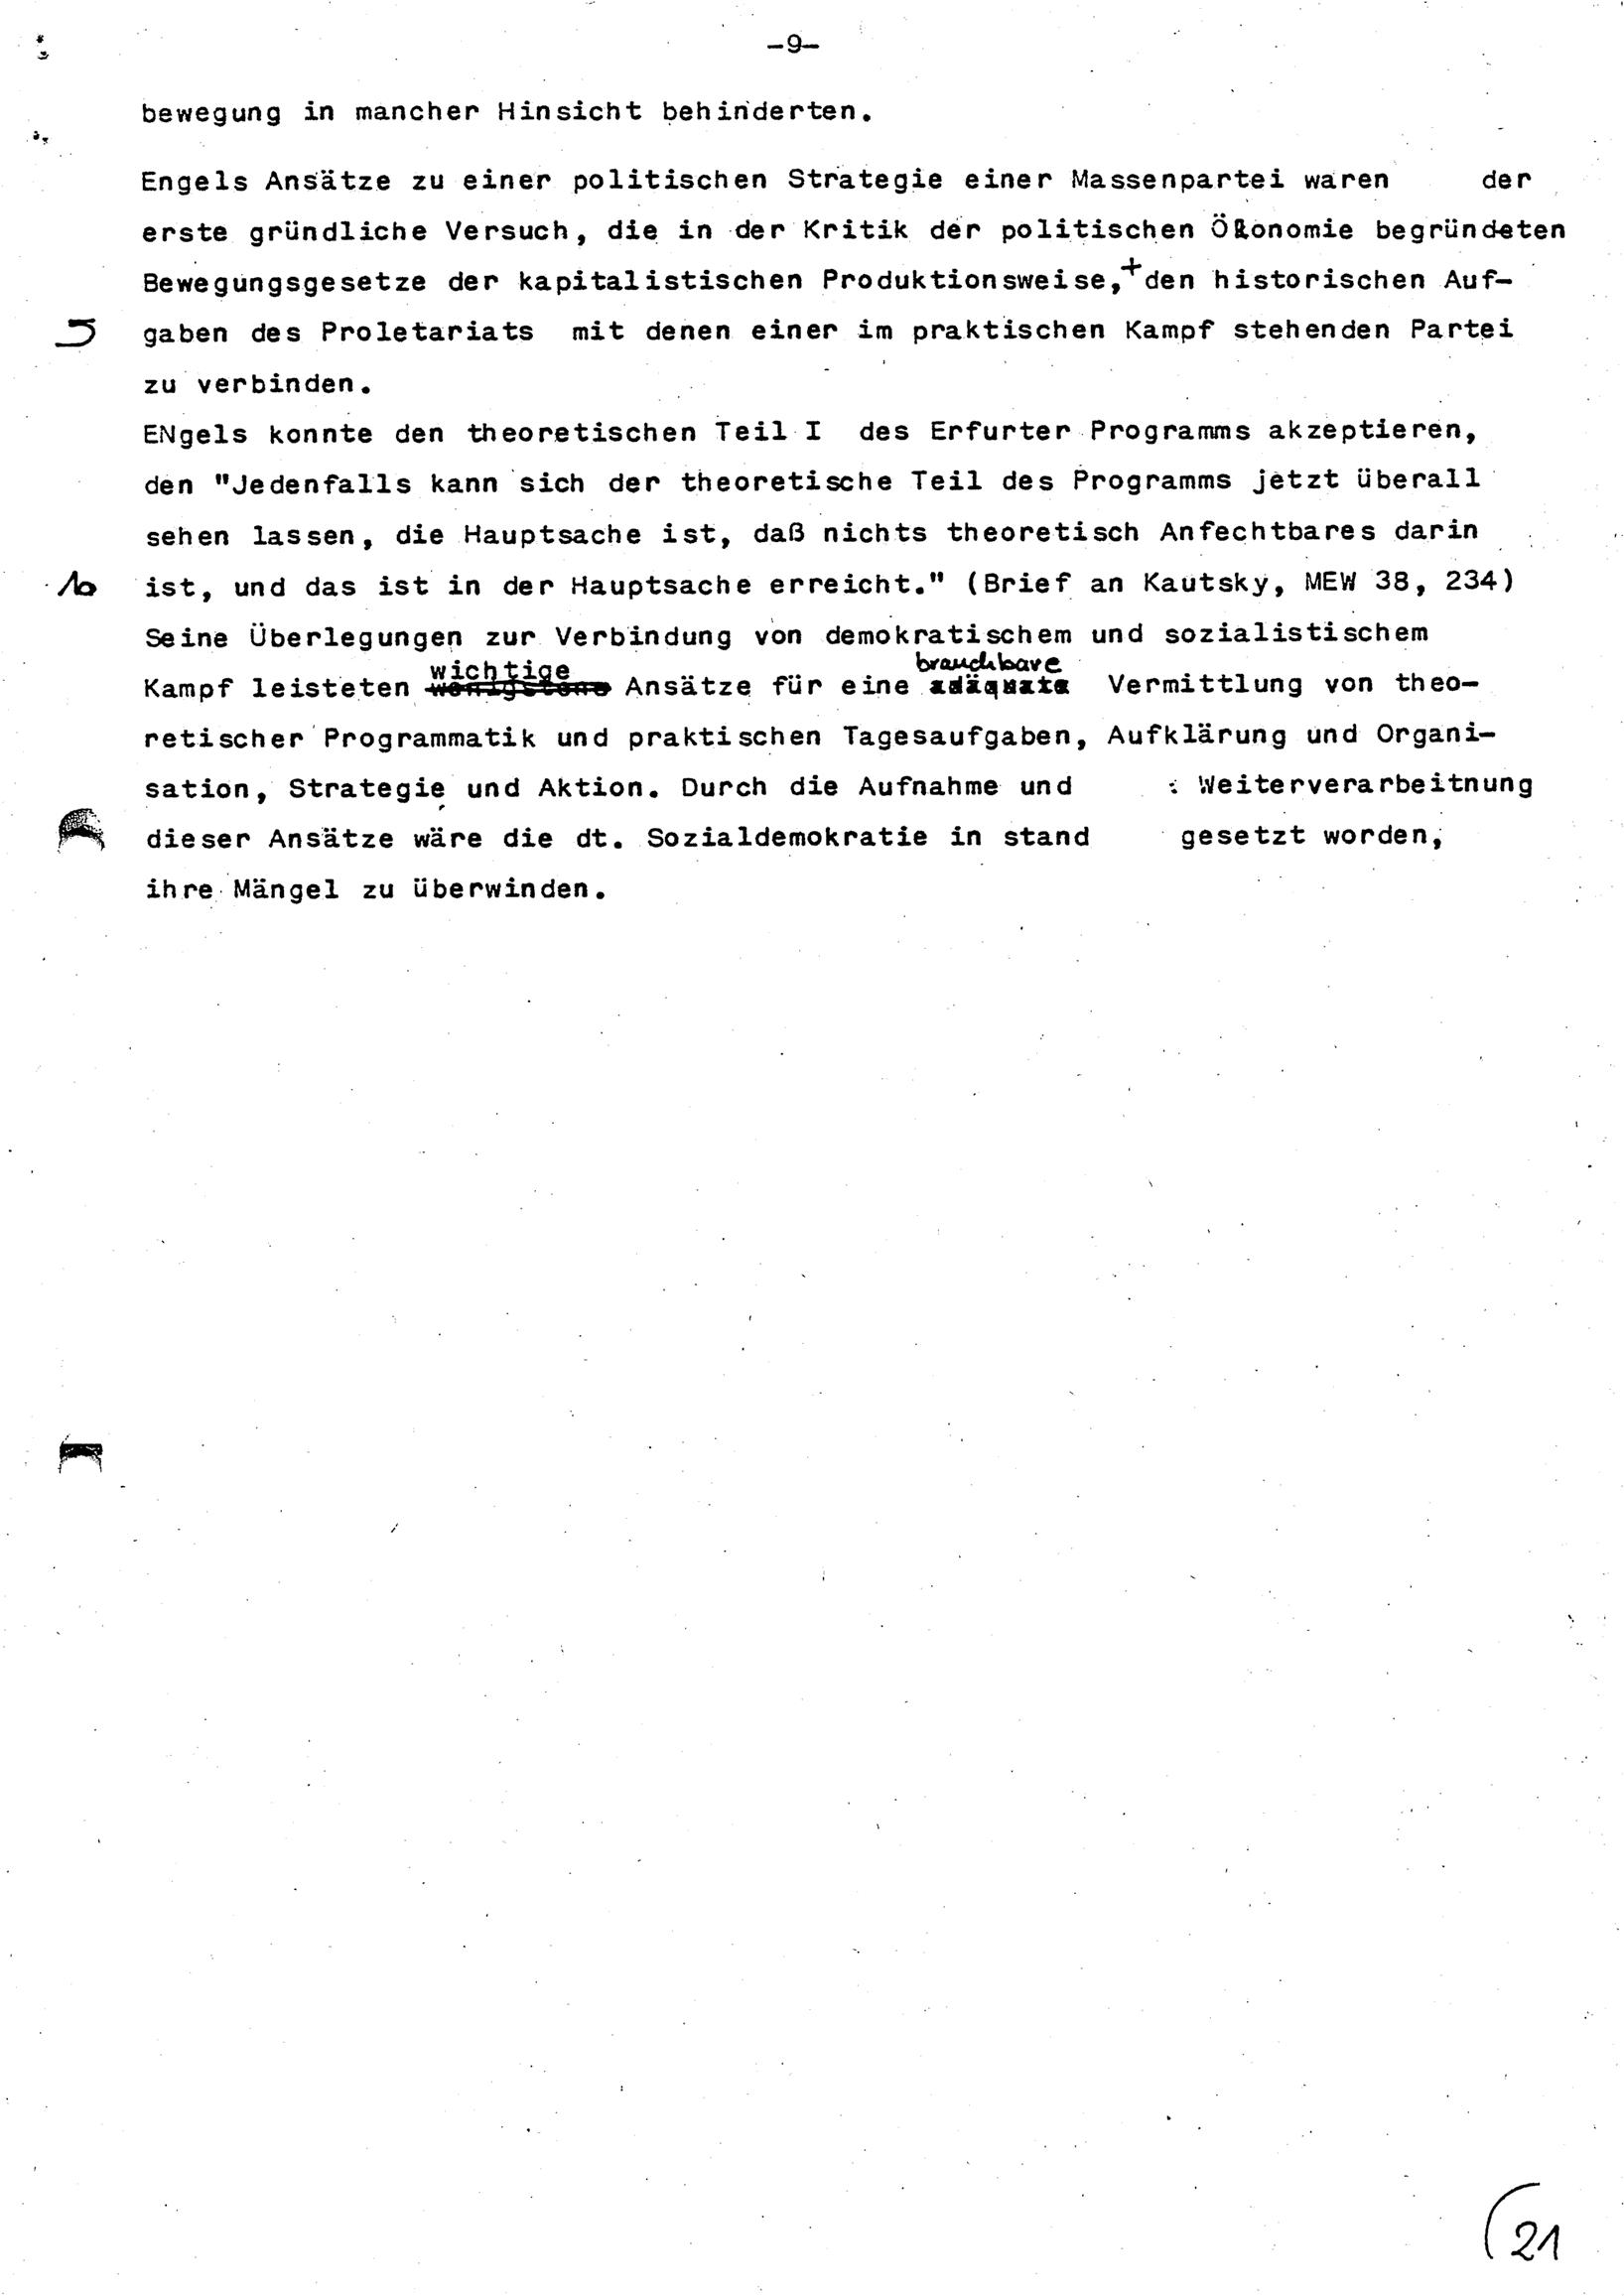 Ulm_KGU_Arbeitsheft_19830425_015_024